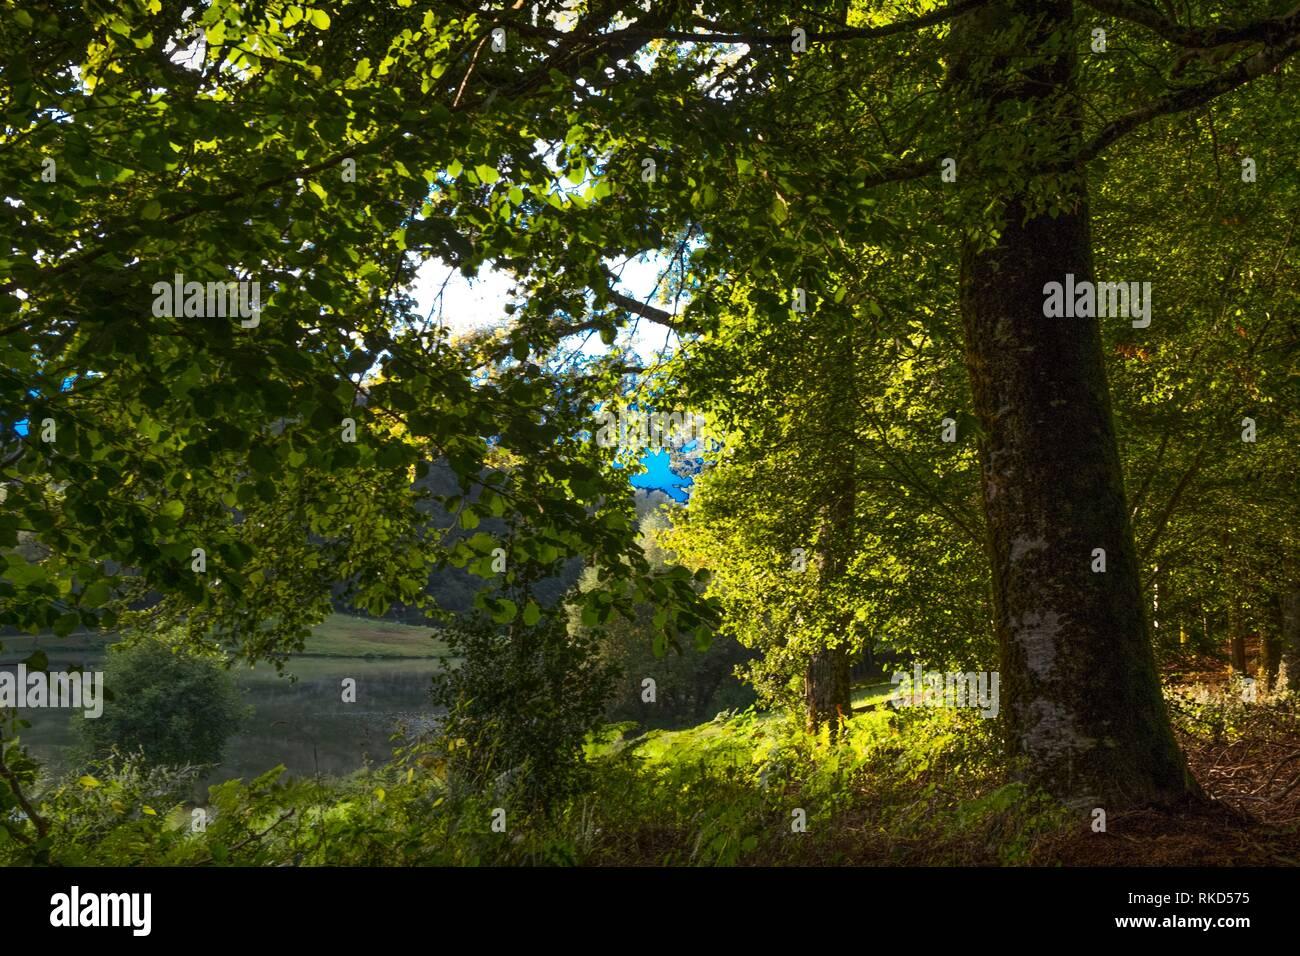 Francia, Occitanie,mucho, depósito de agua por la Tronquiere. Imagen De Stock